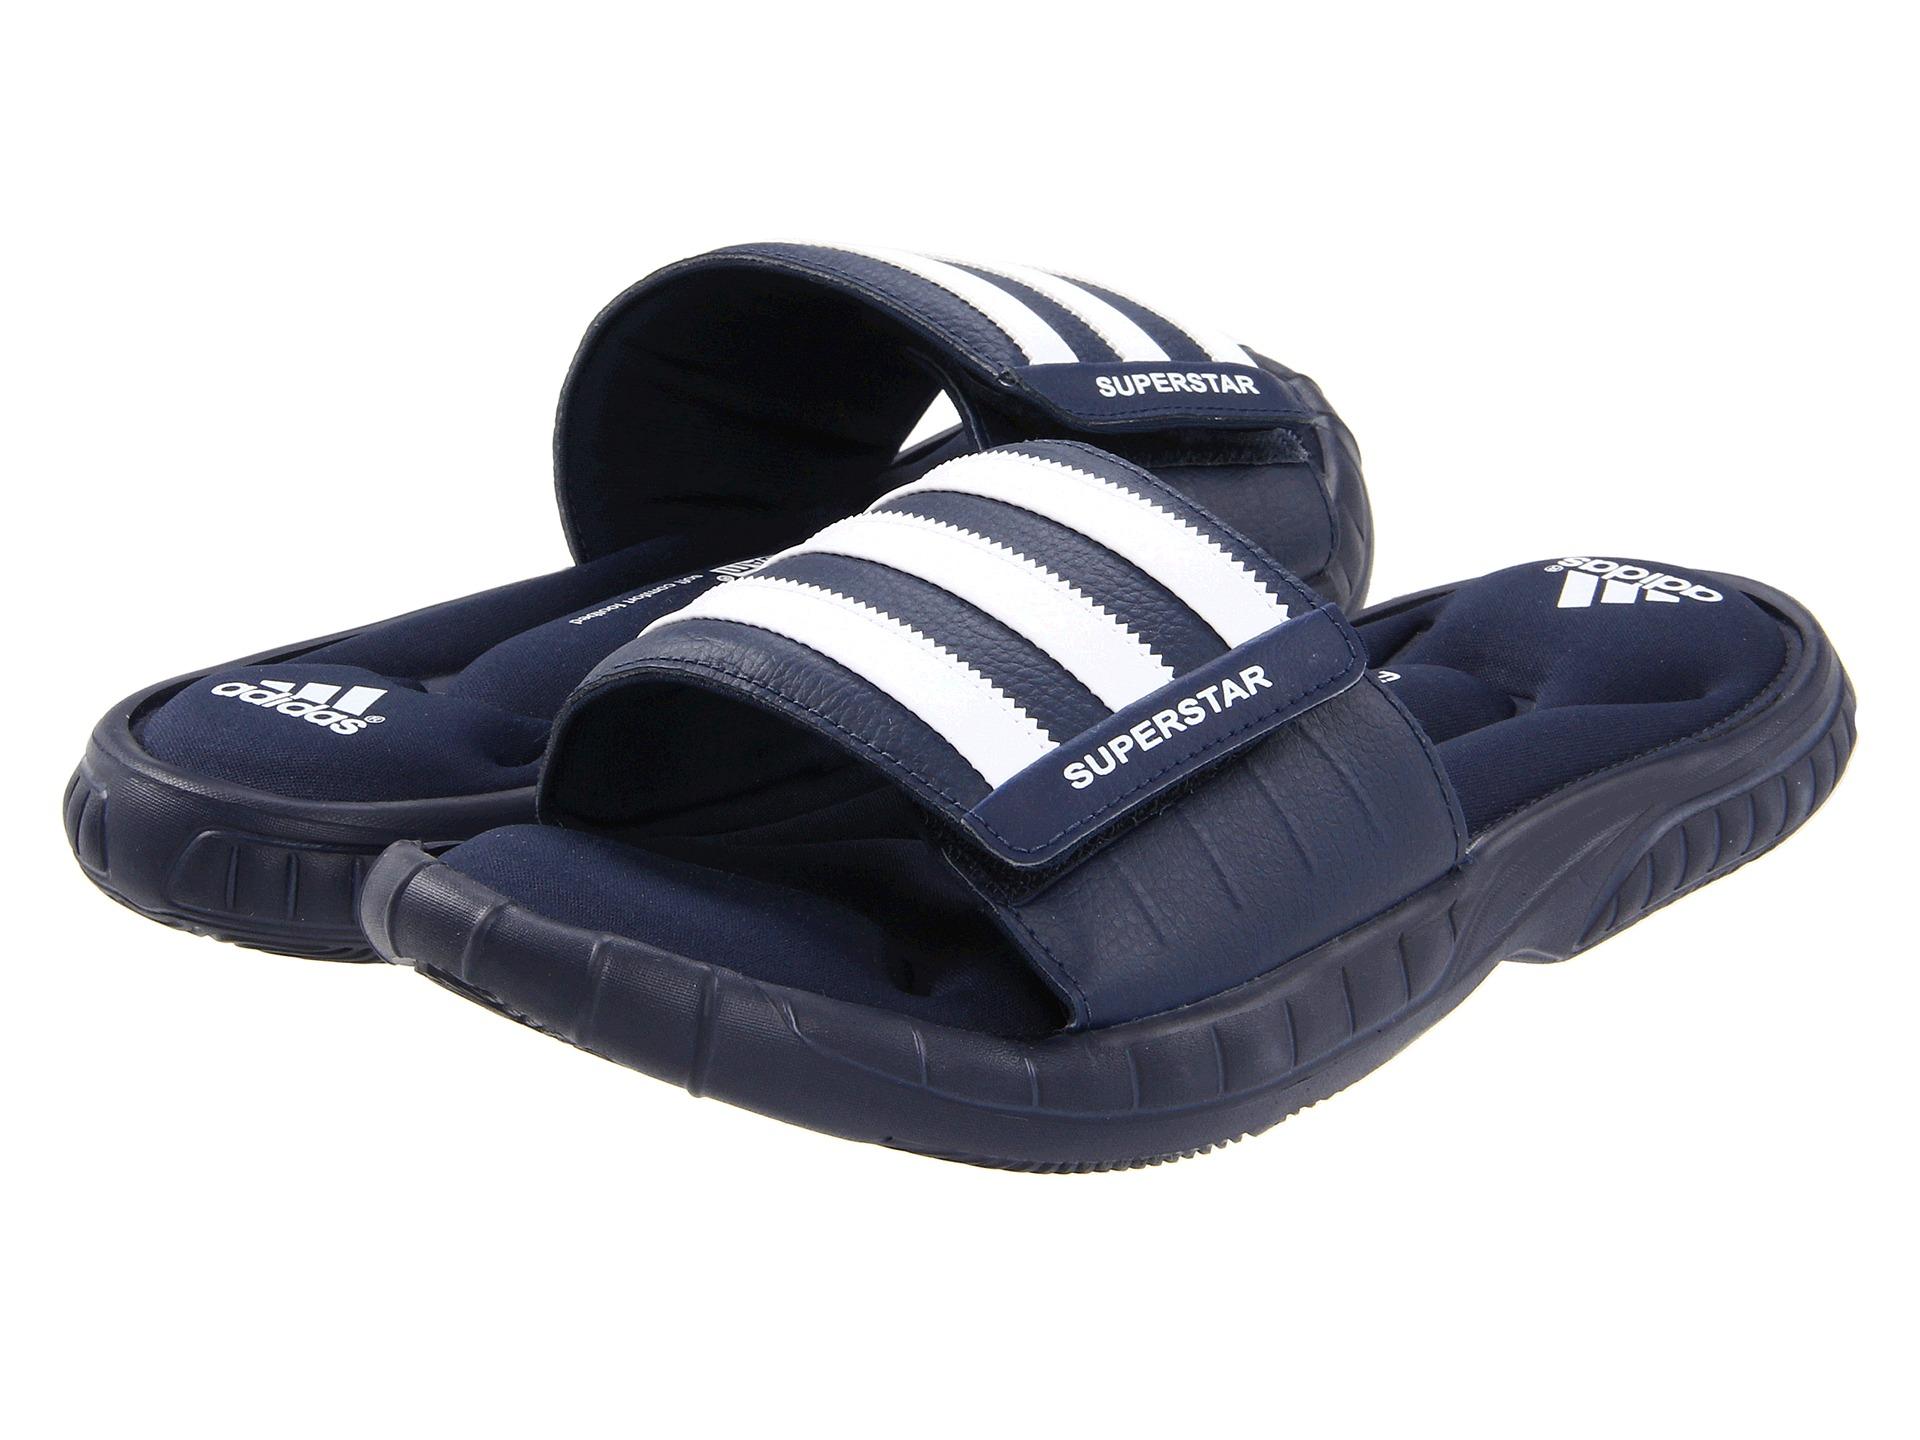 Adidas memory foam sandals on sale >off43%)